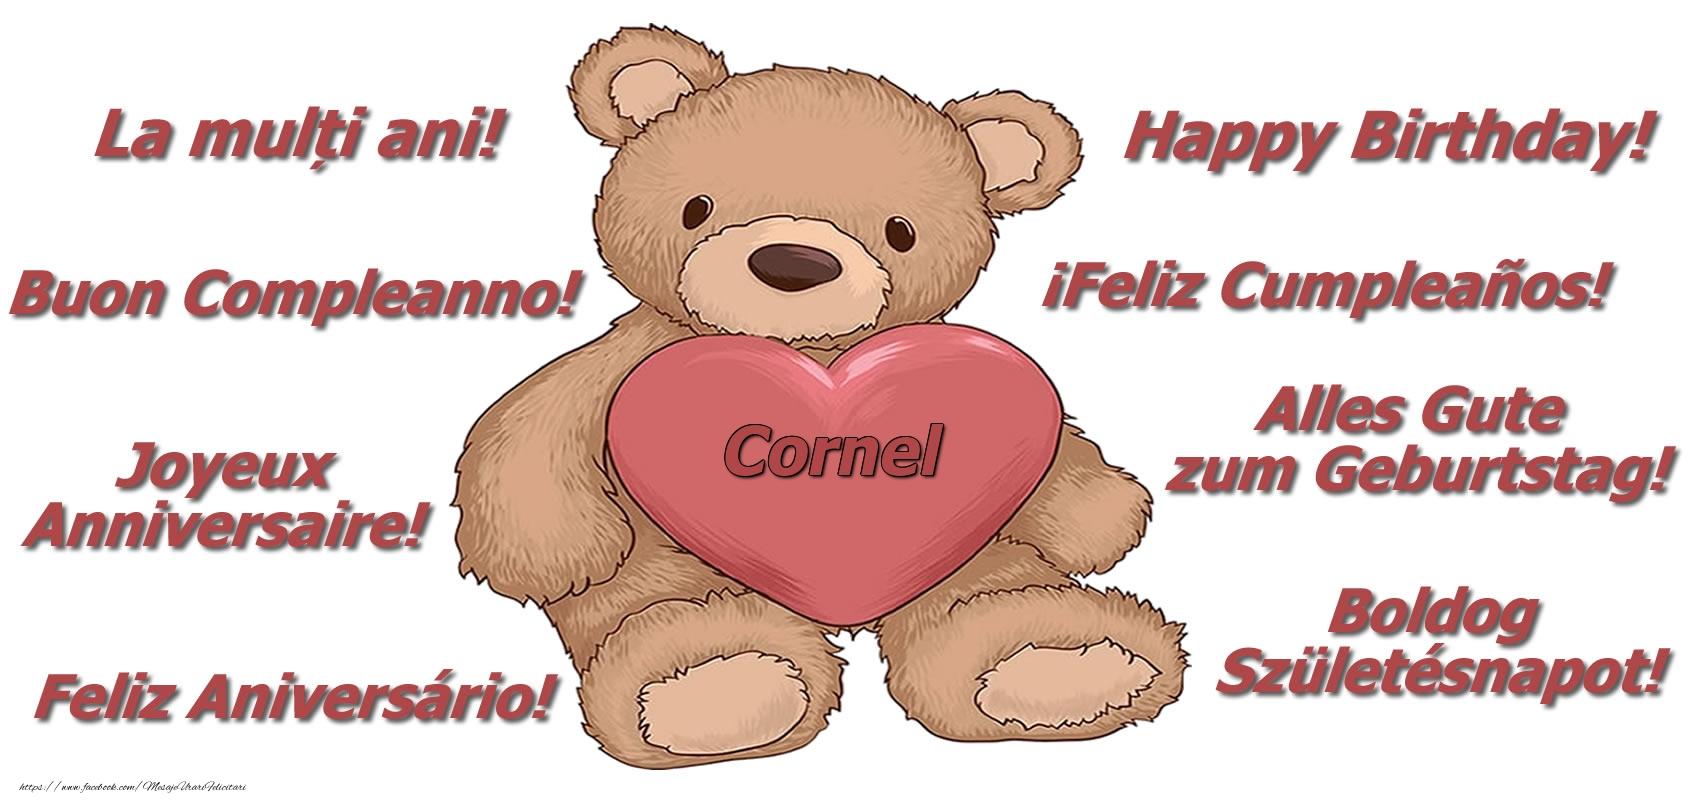 Felicitari de zi de nastere - La multi ani Cornel! - Ursulet